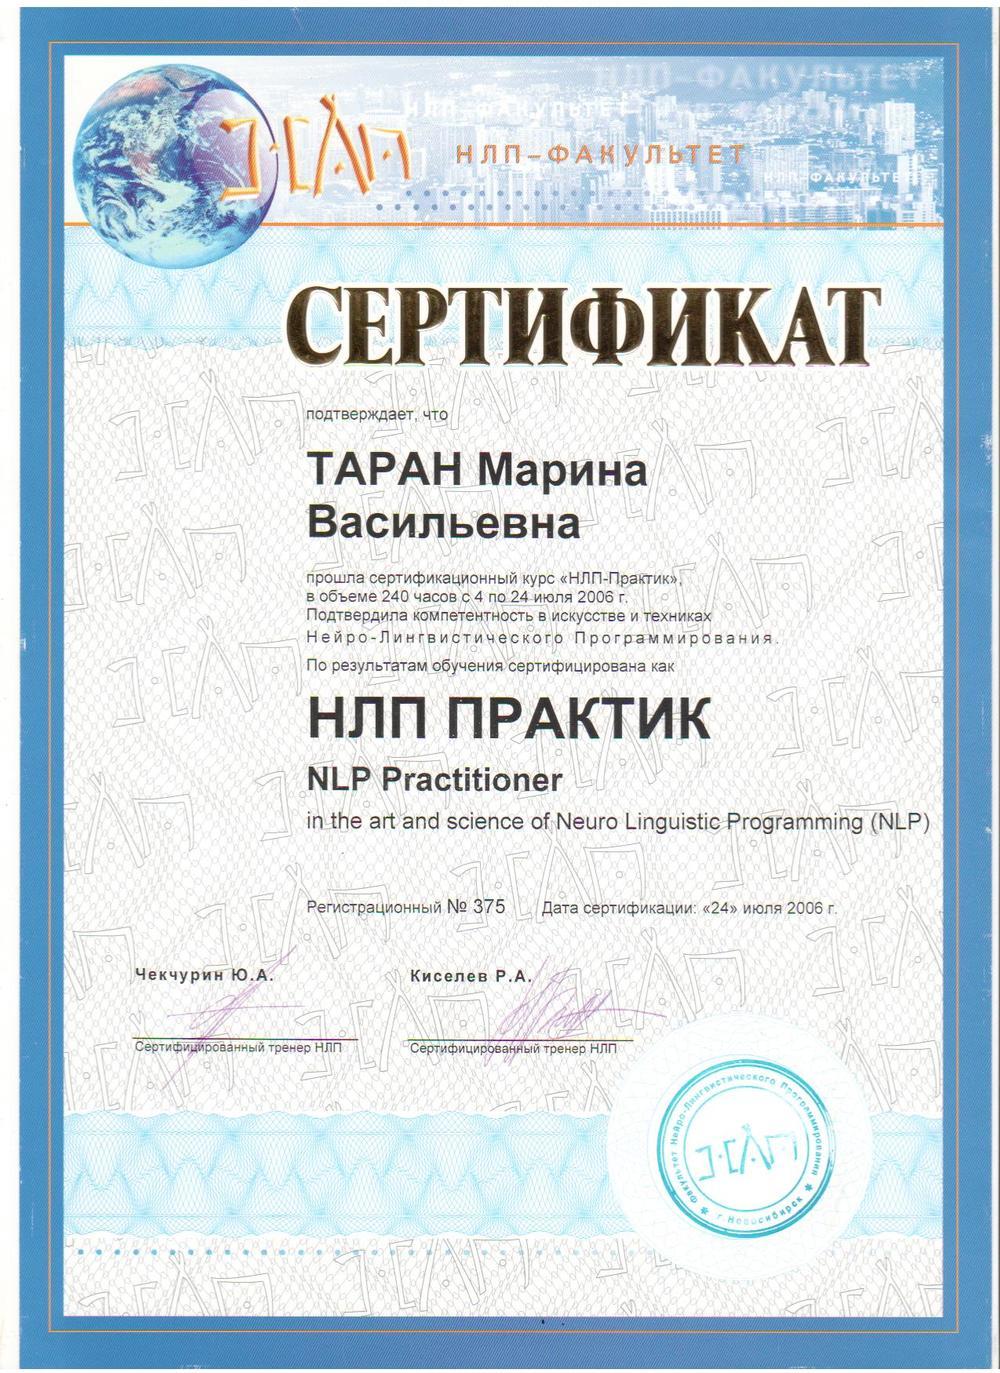 НЛП Практика.jpg